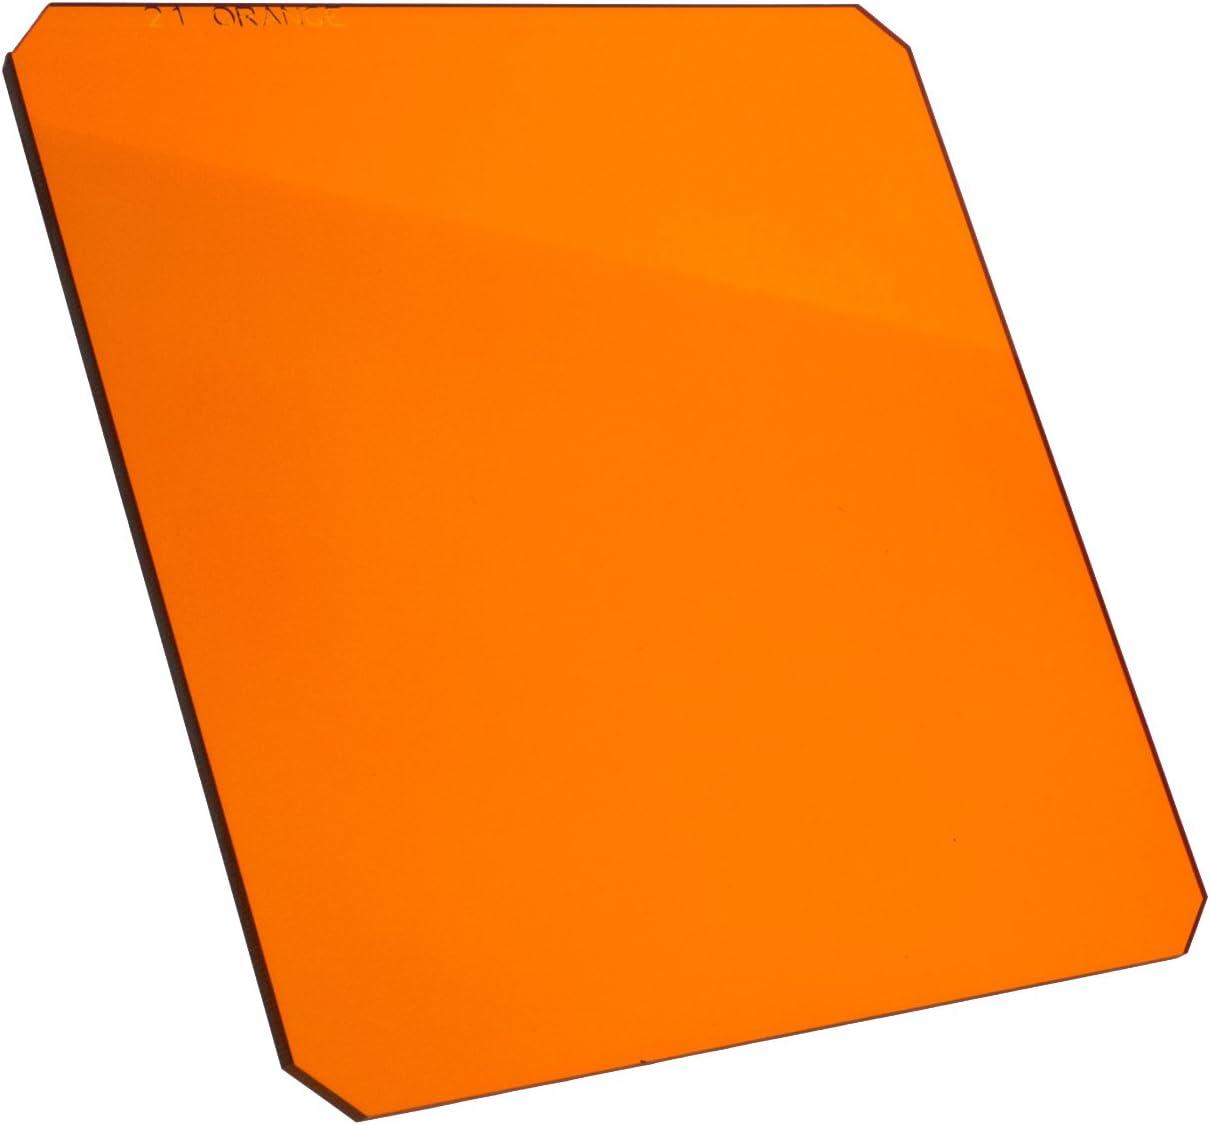 2.67x3.35 Resin Black and White 21 Orange Formatt-Hitech 67x85mm